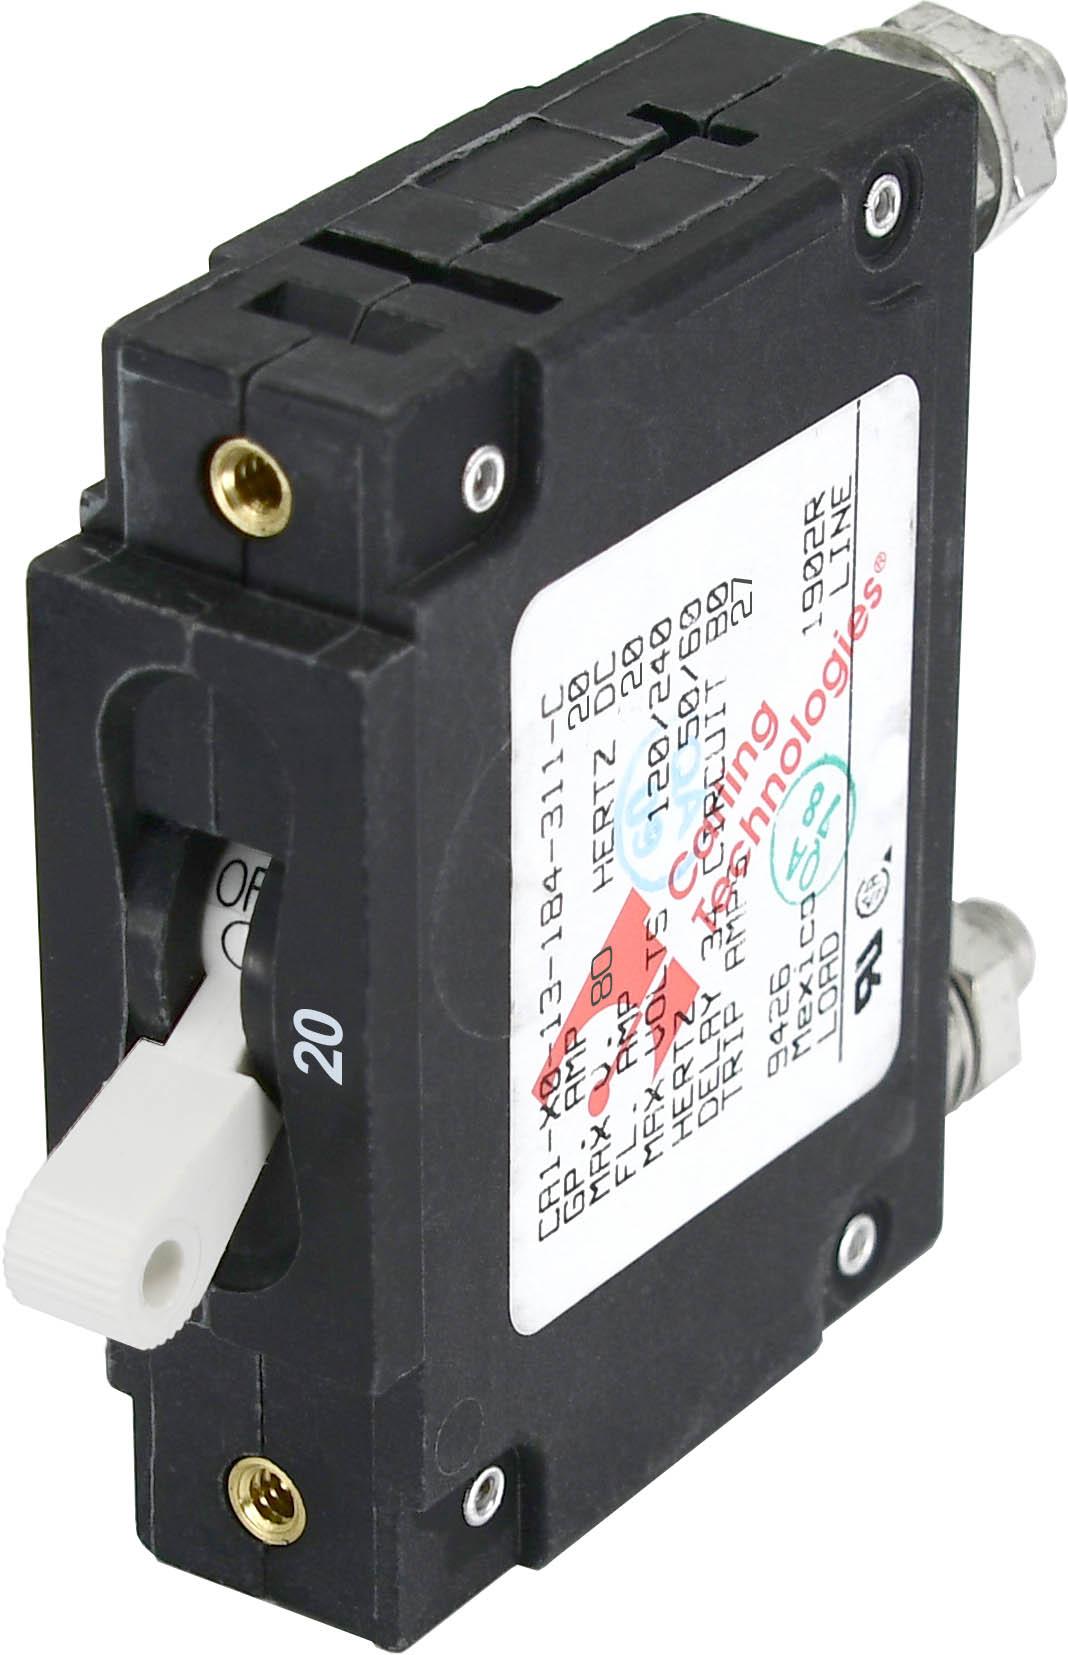 C-Series White Toggle Circuit Breaker - Single Pole 20 Amp - Blue ...